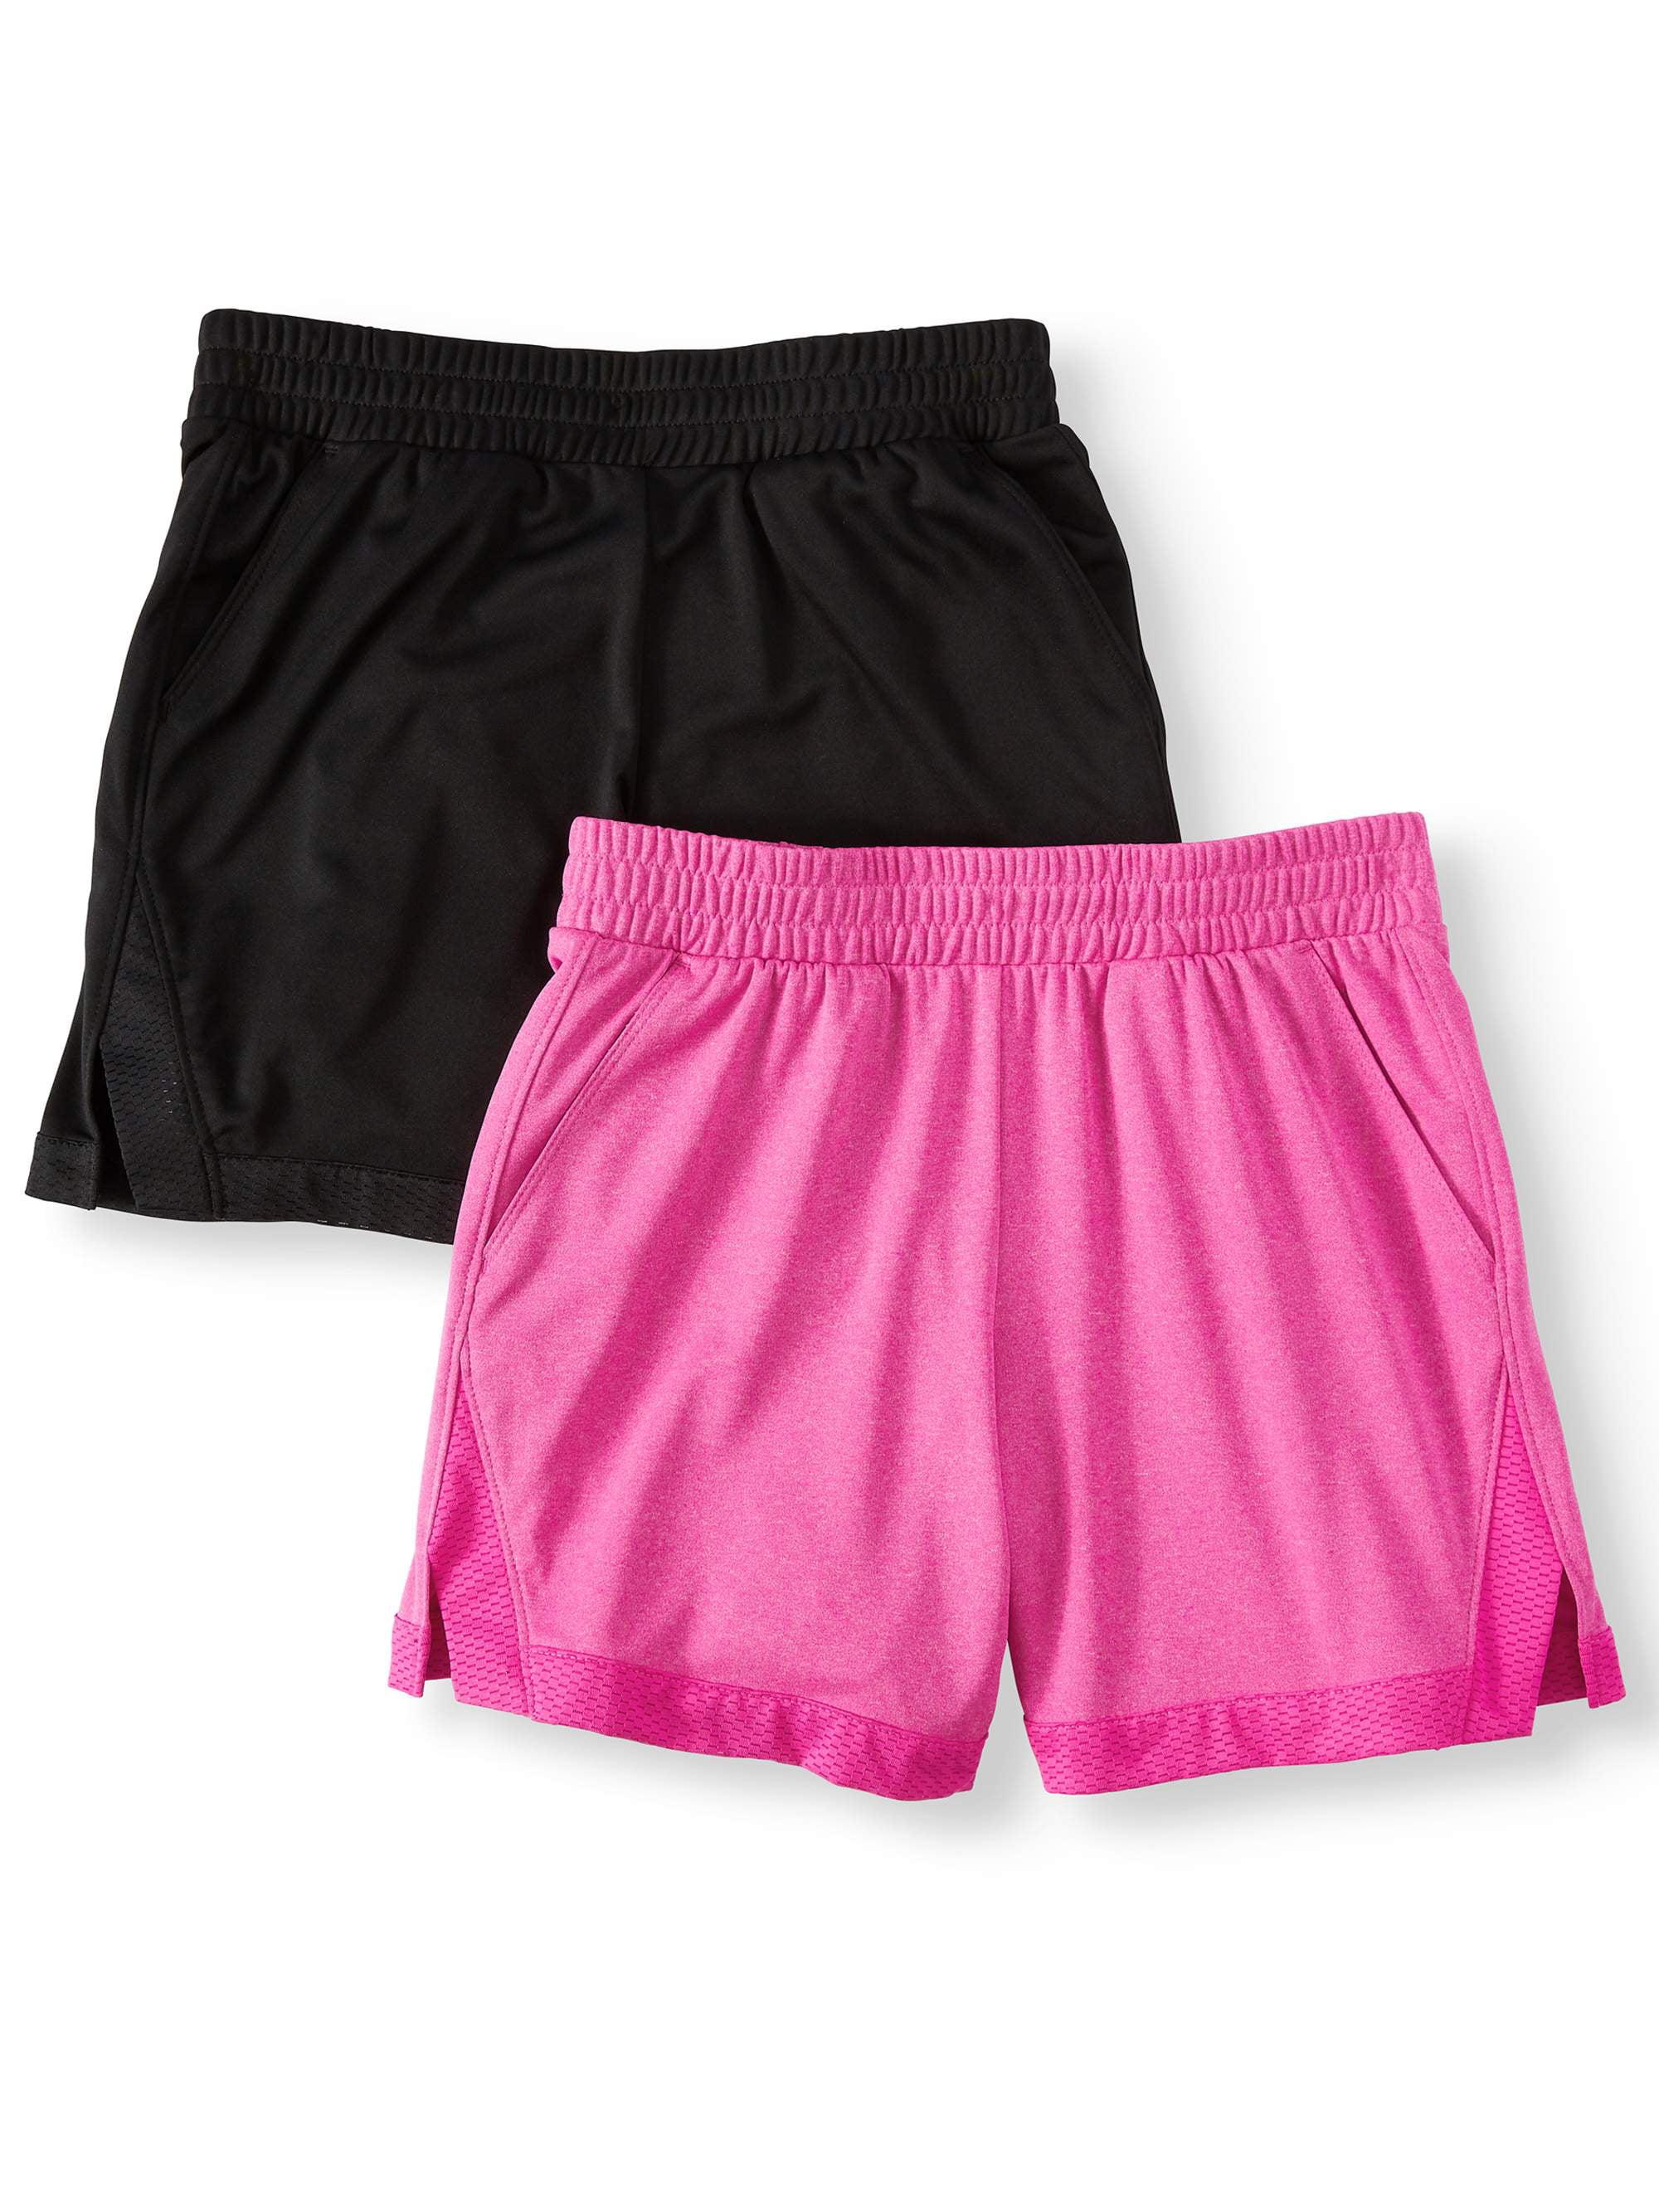 Athletic Works Athletic Works Active Mesh Shorts 2 Pack Little Girls Big Girls Walmart Com Walmart Com [ 2667 x 2000 Pixel ]